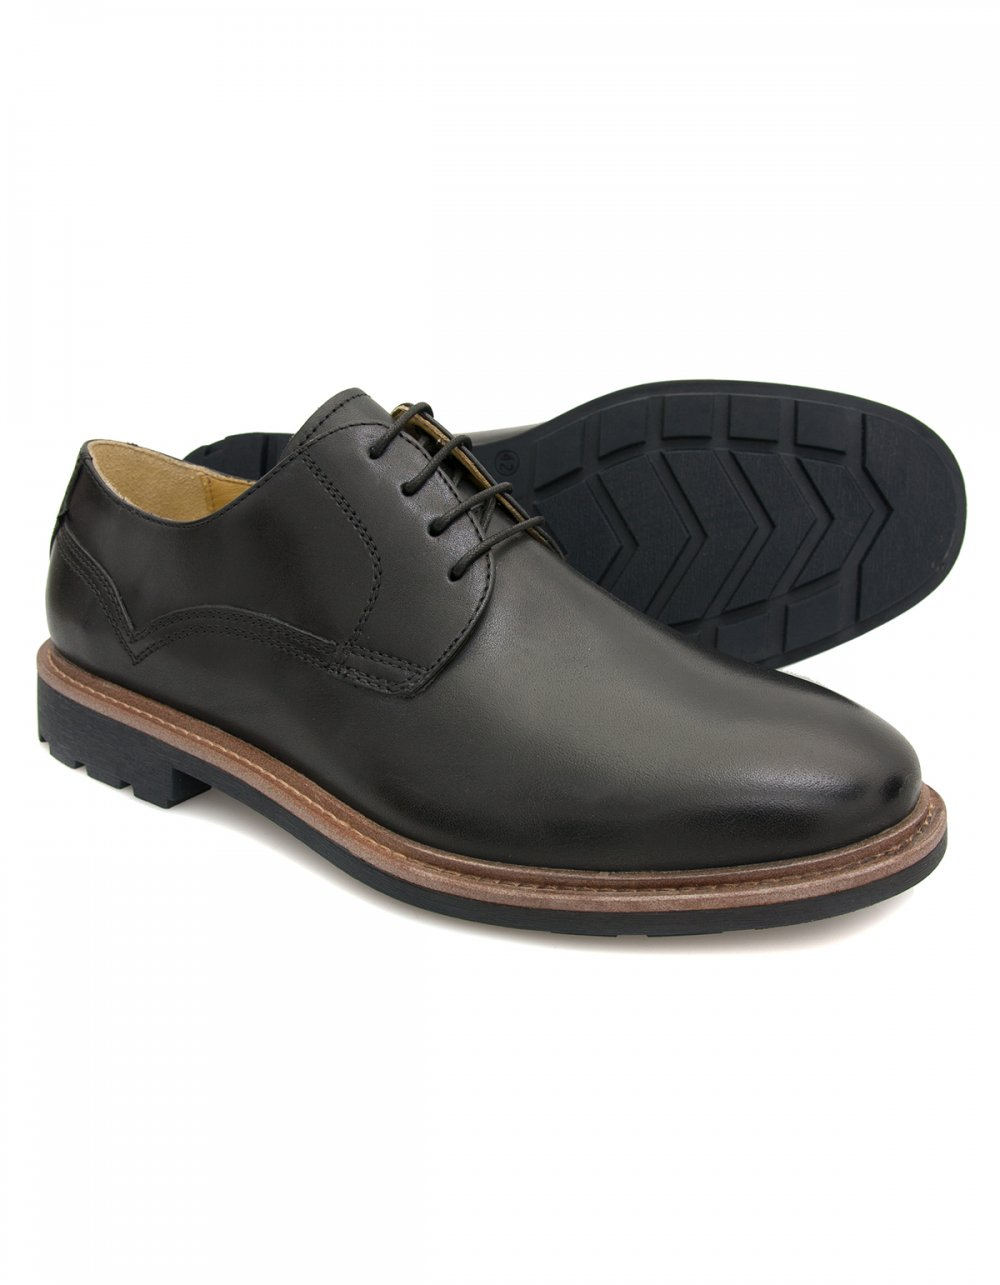 steptronic lake casual lace shoes black